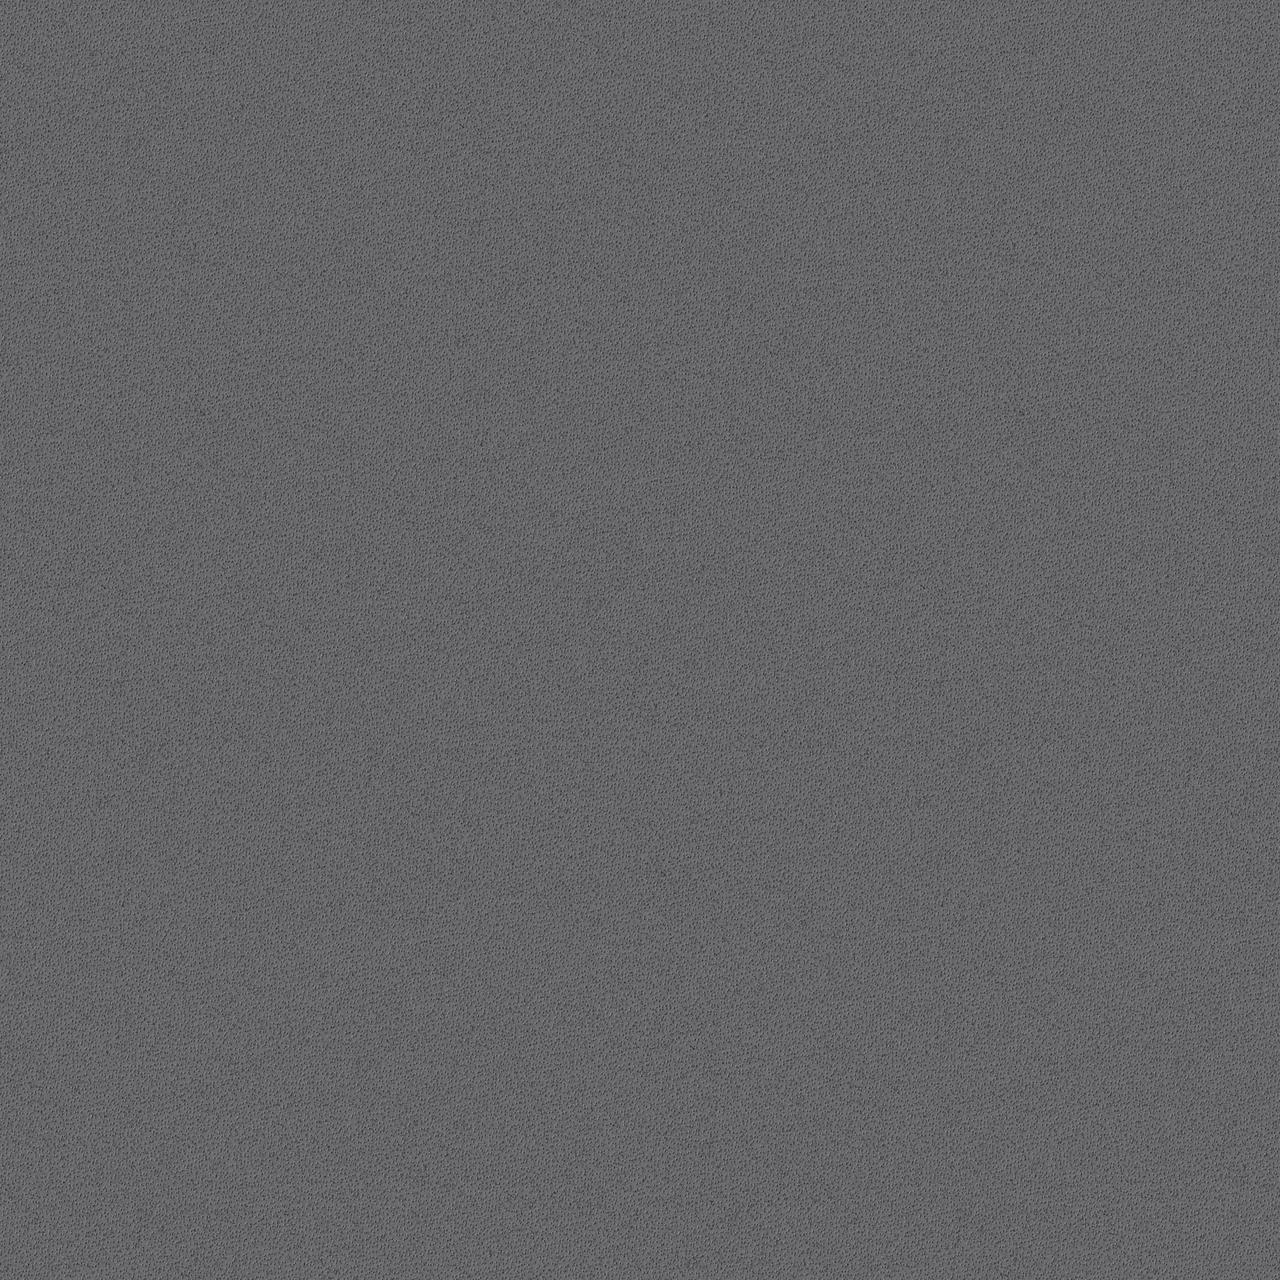 A-texture-seamless-flor-smok by shishas